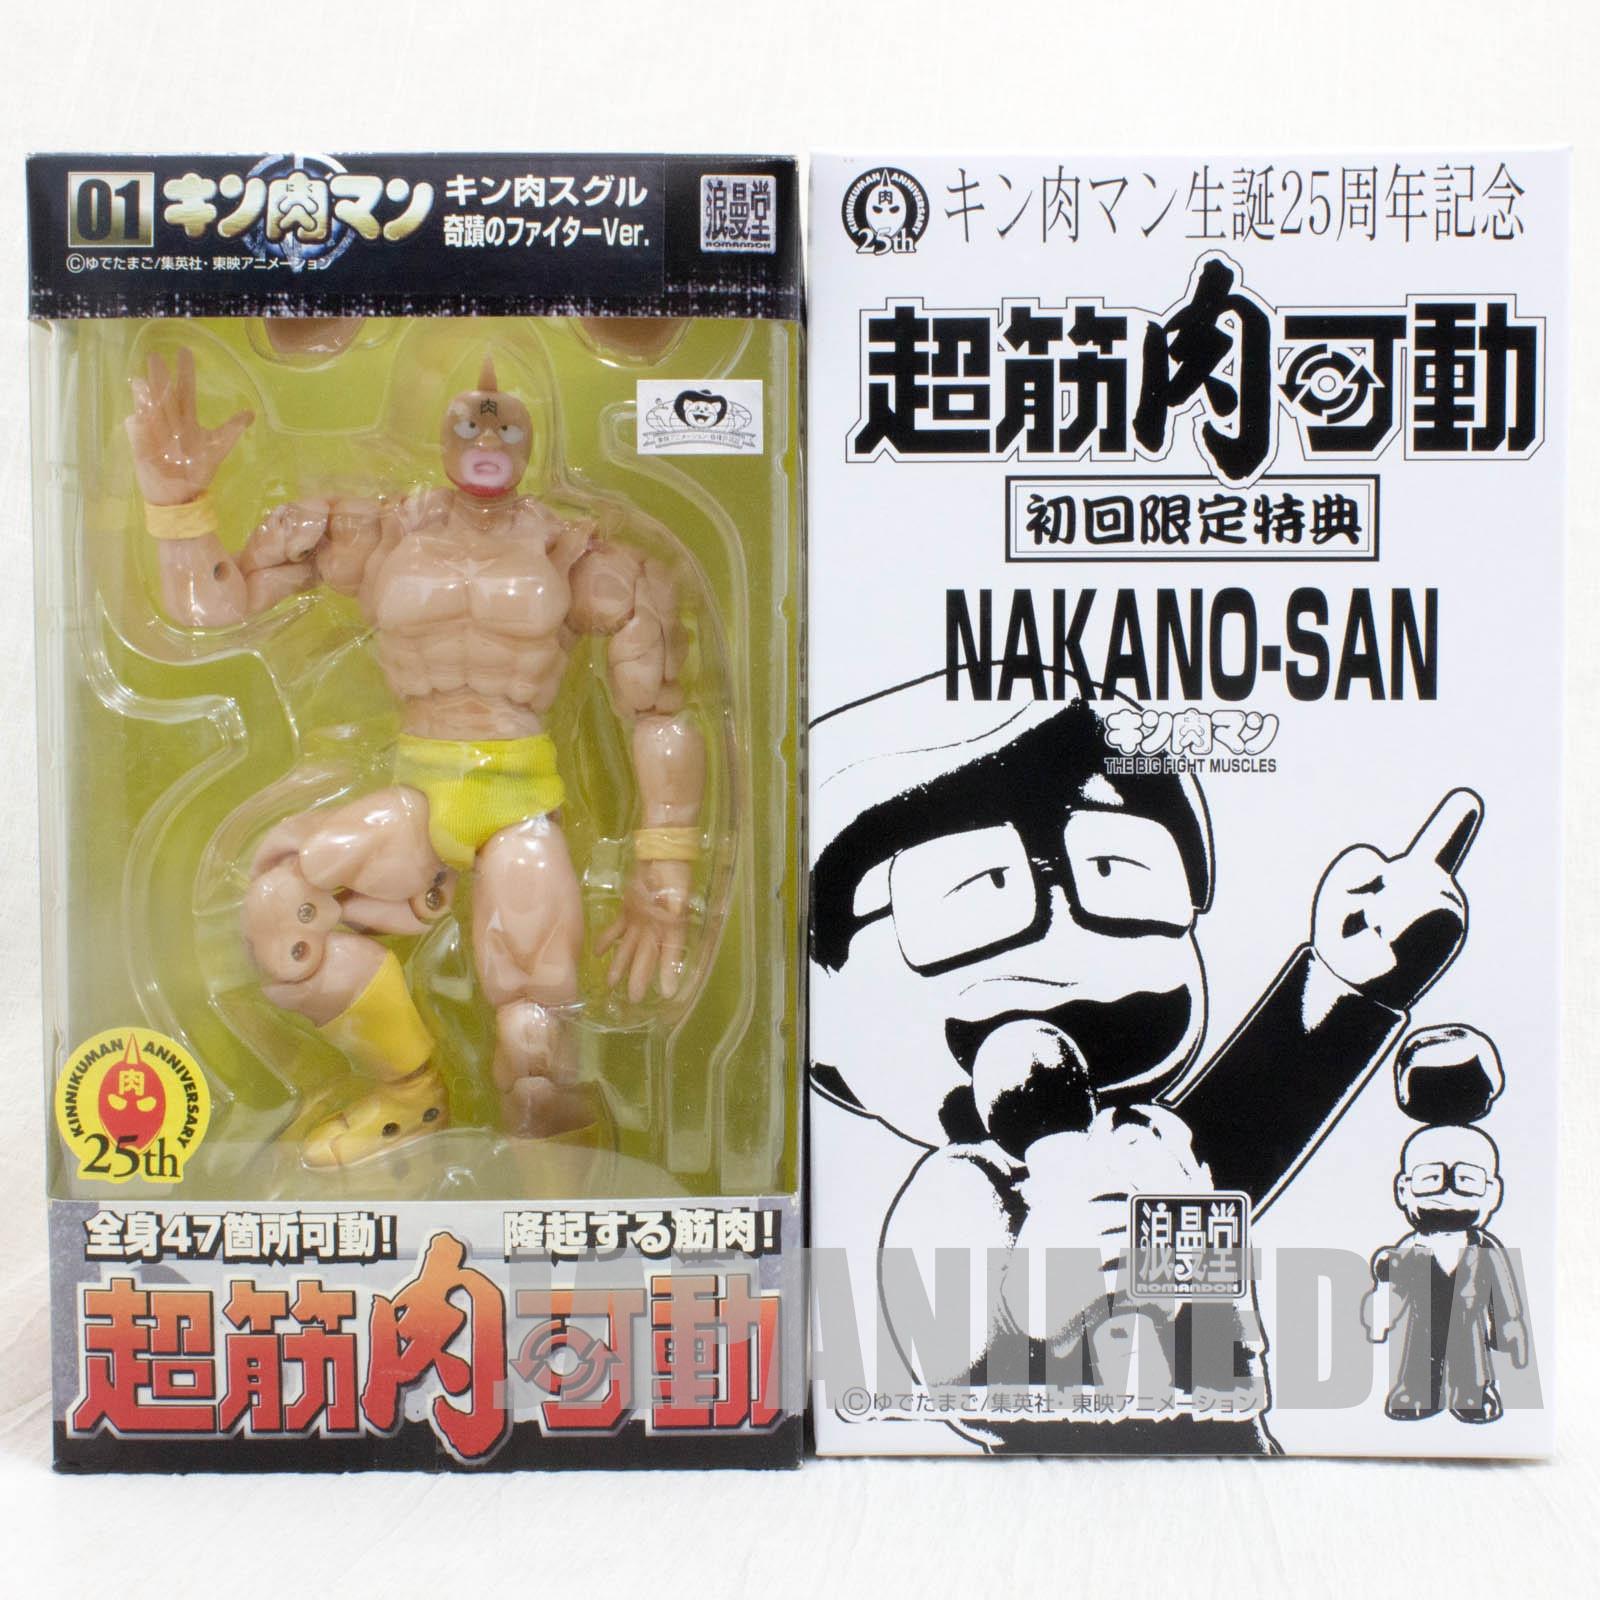 Kinnikuman Full-Action Figure + Announcer Nakano Set Romando ULTIMATE MUSCLE